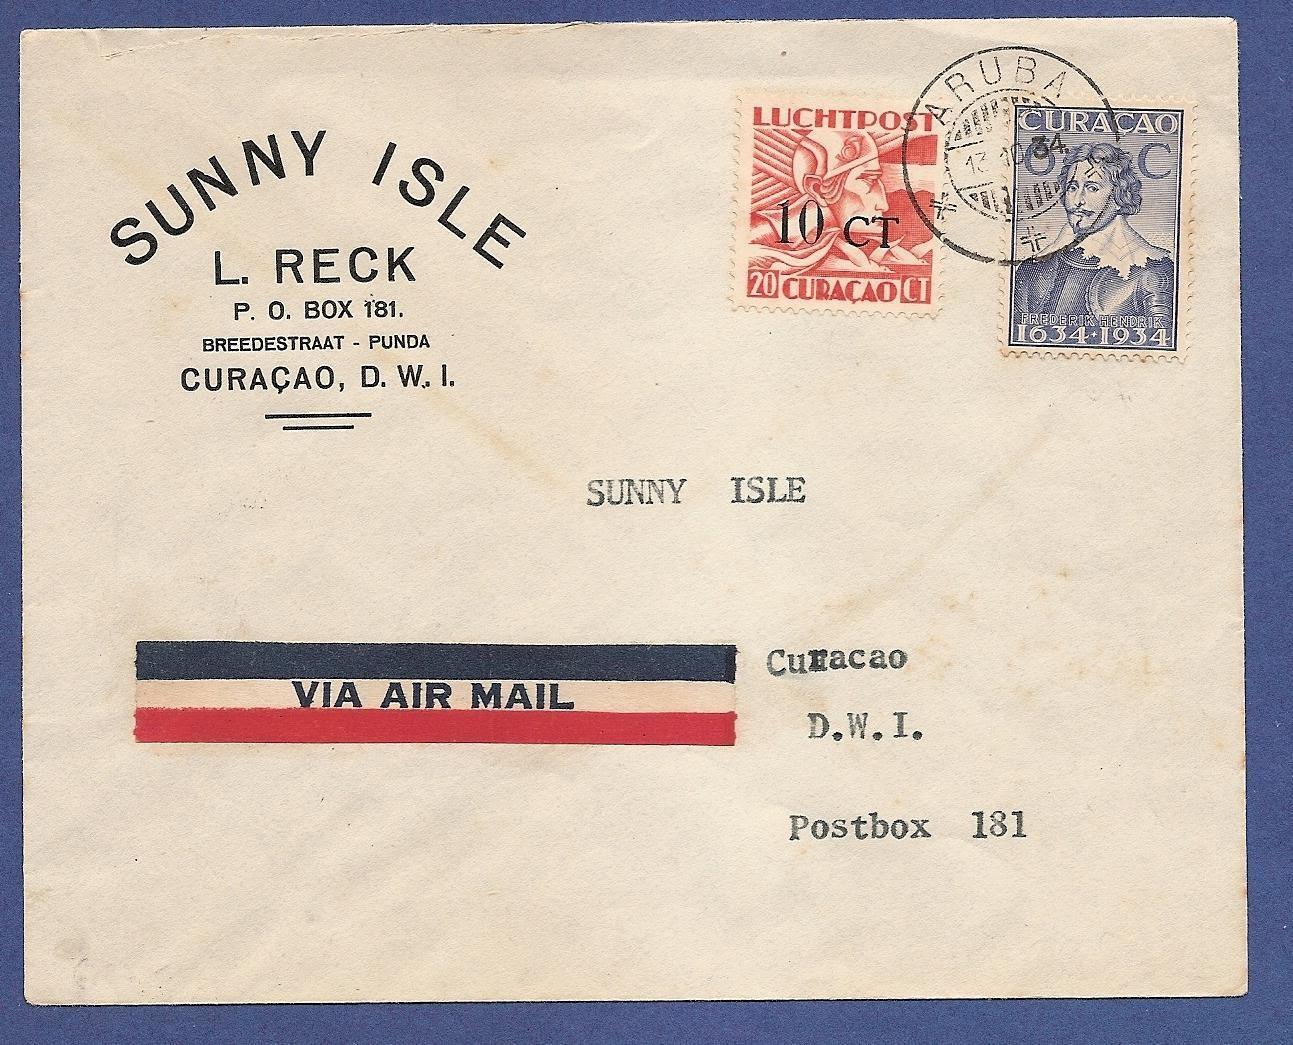 CURAÇAO luchtpost brief 1934 Aruba naar Curaçao